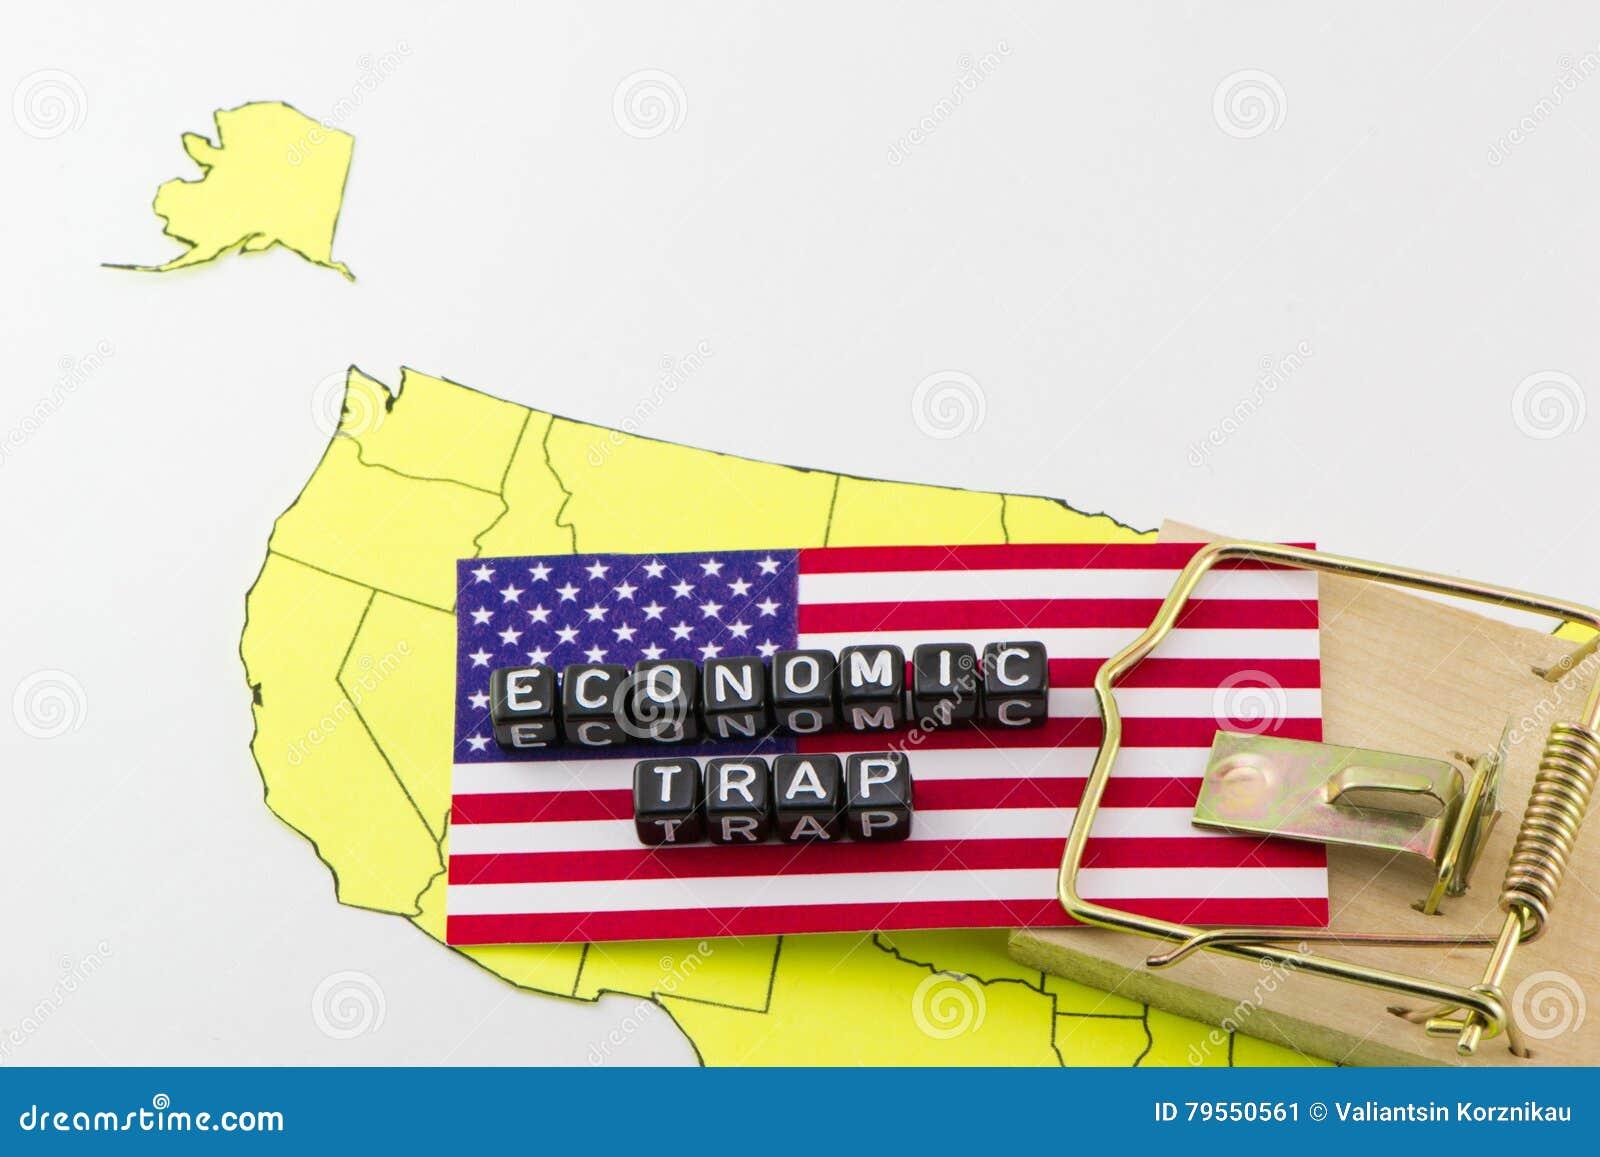 Us Economic Trap Stock Image Image Of Gallows America 79550561